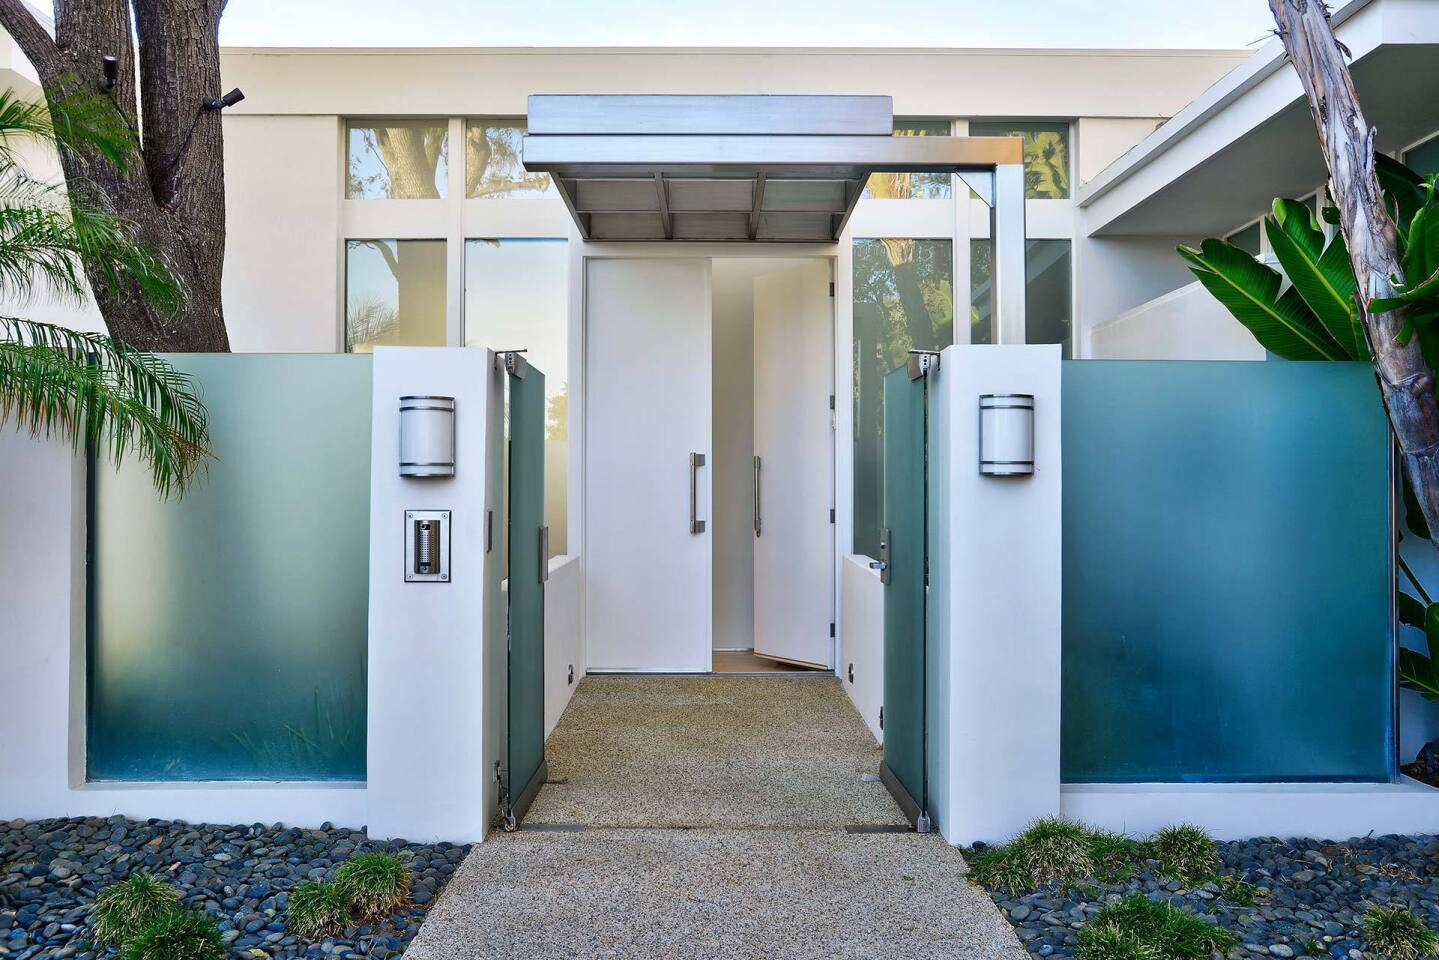 Doors that swing open in style